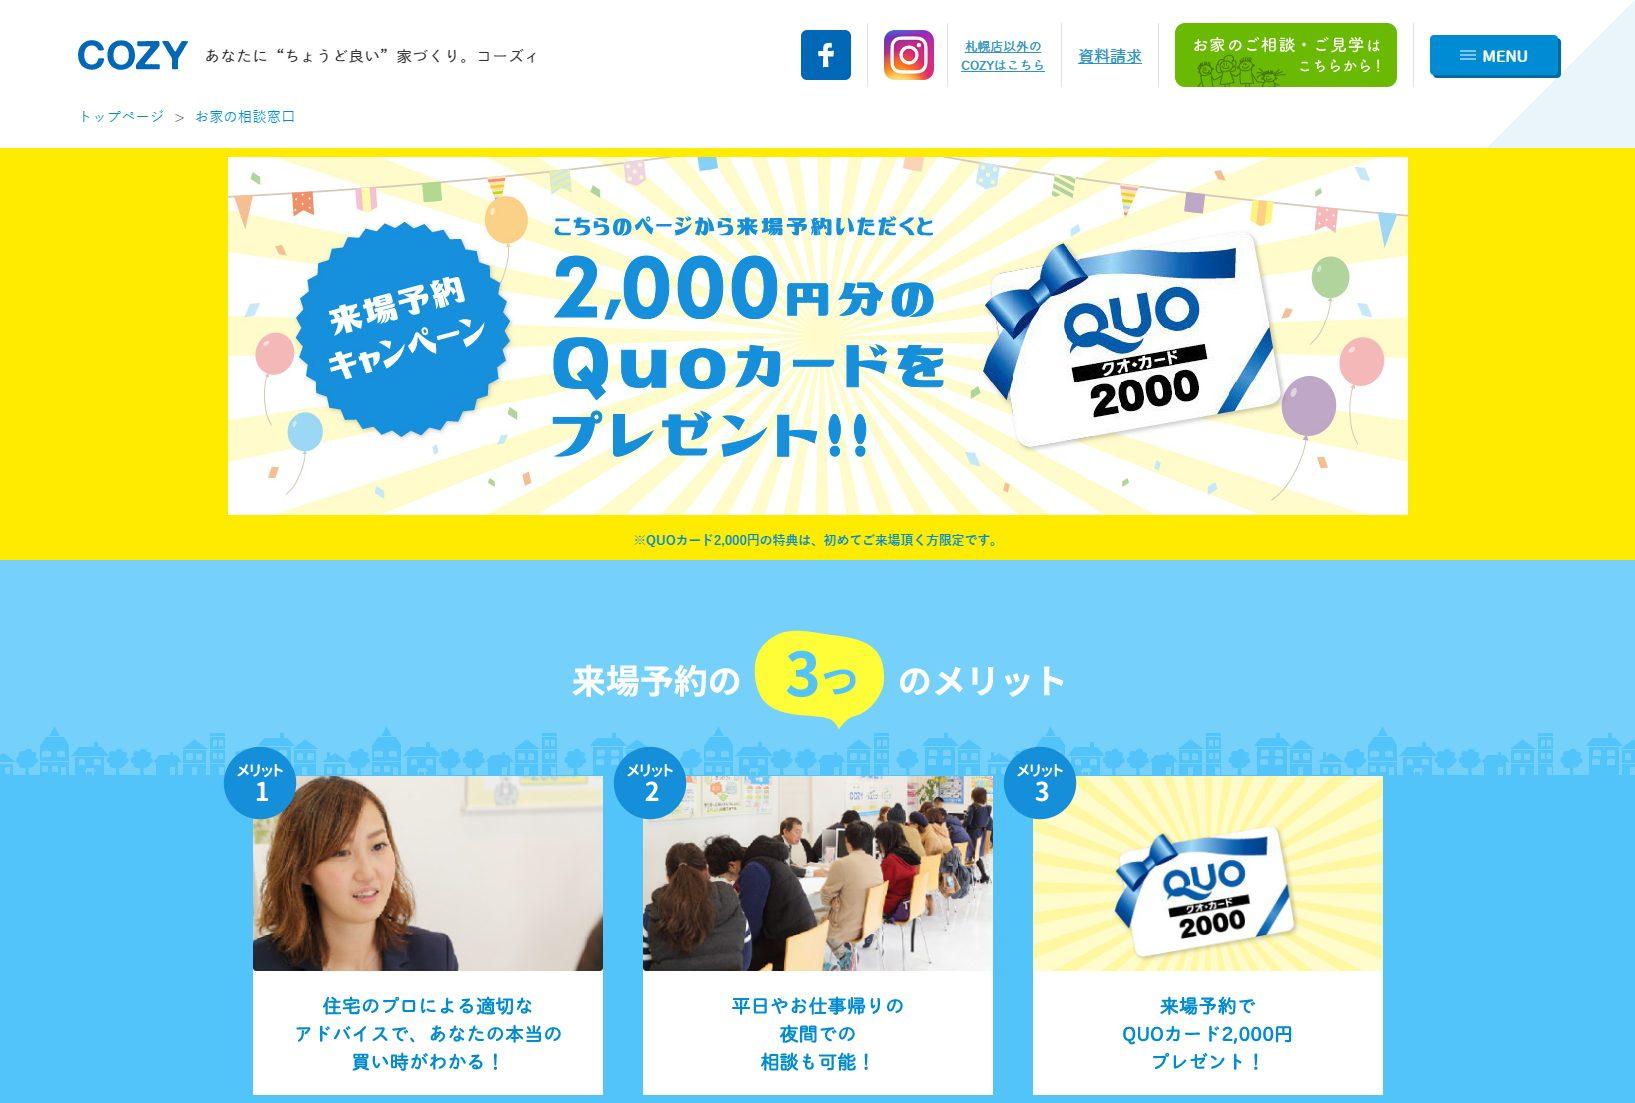 COZY見学予約サイト-パソコン画面1